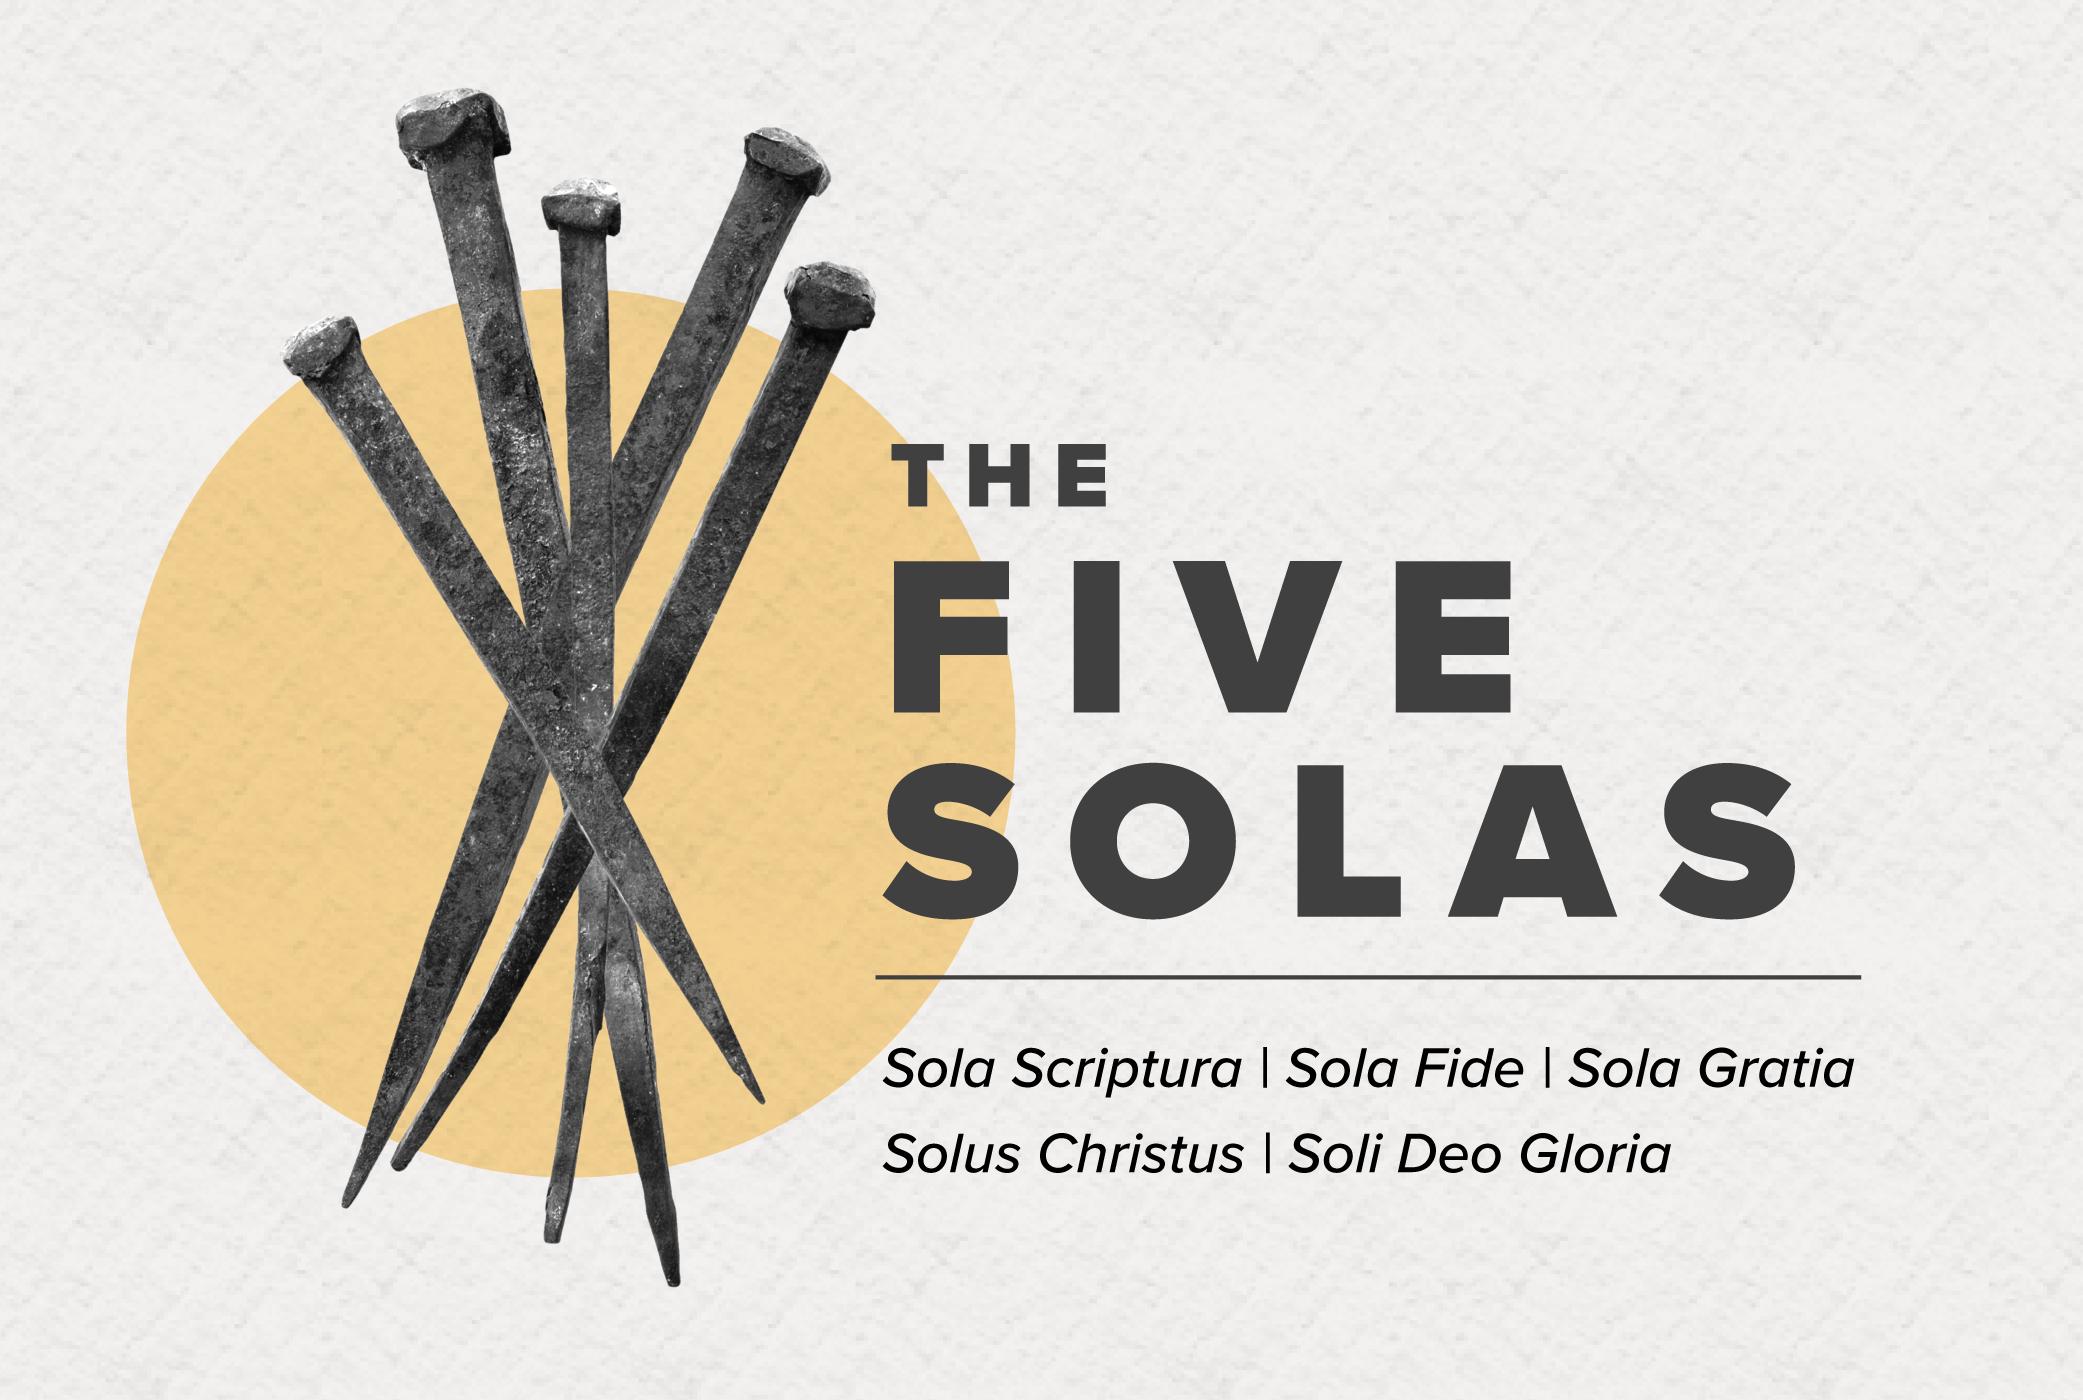 Solus soli sola fide scriptura deo gratia sola gloria sola christus The Five